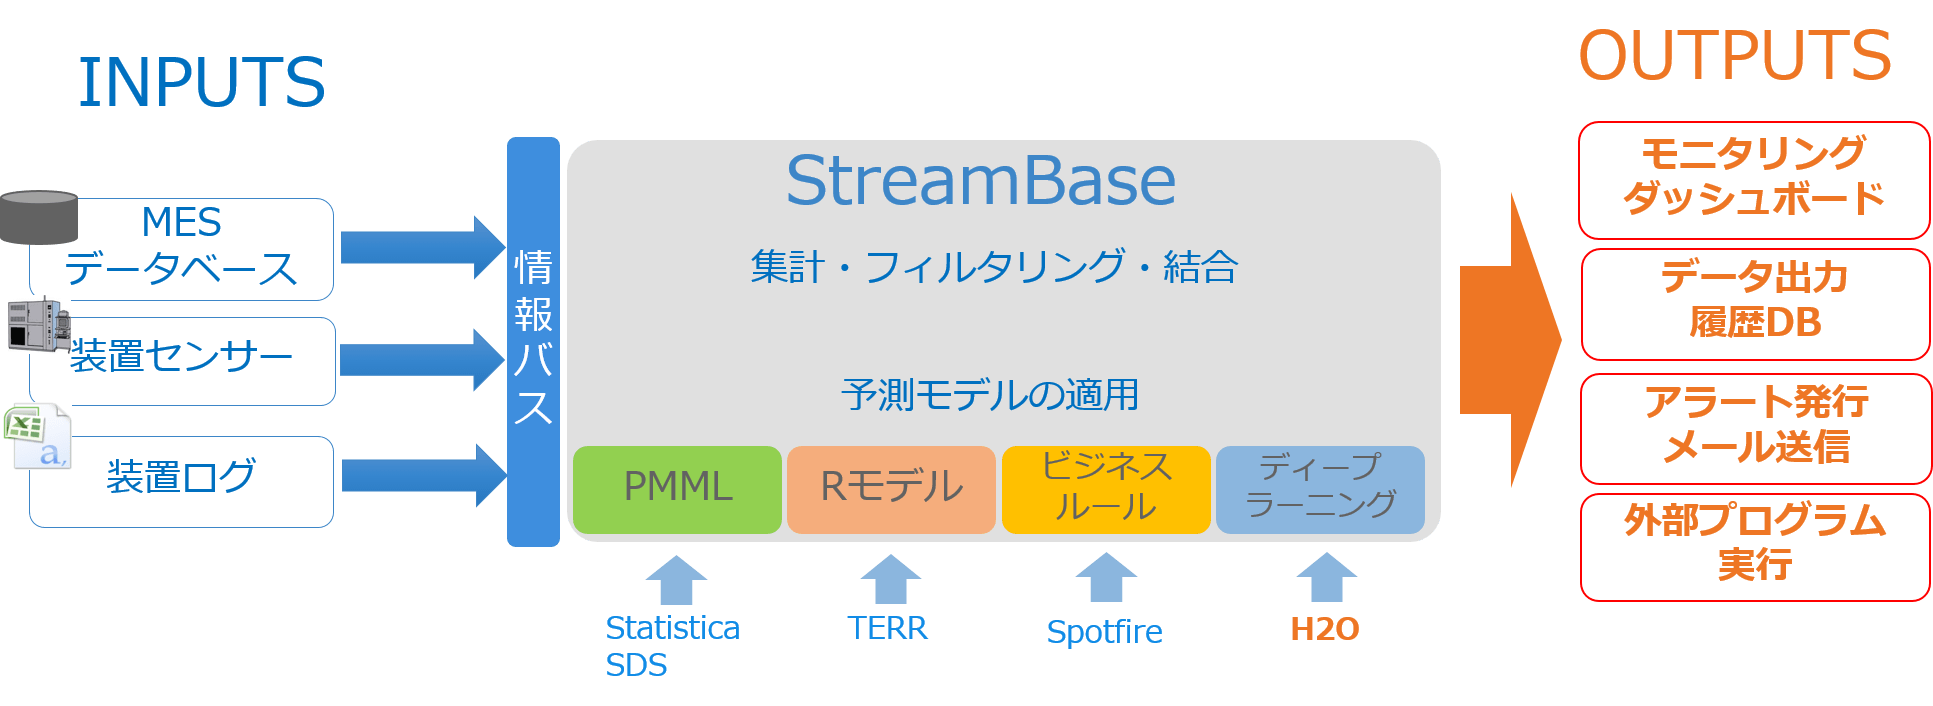 TIBCO StreamBase® 概念図